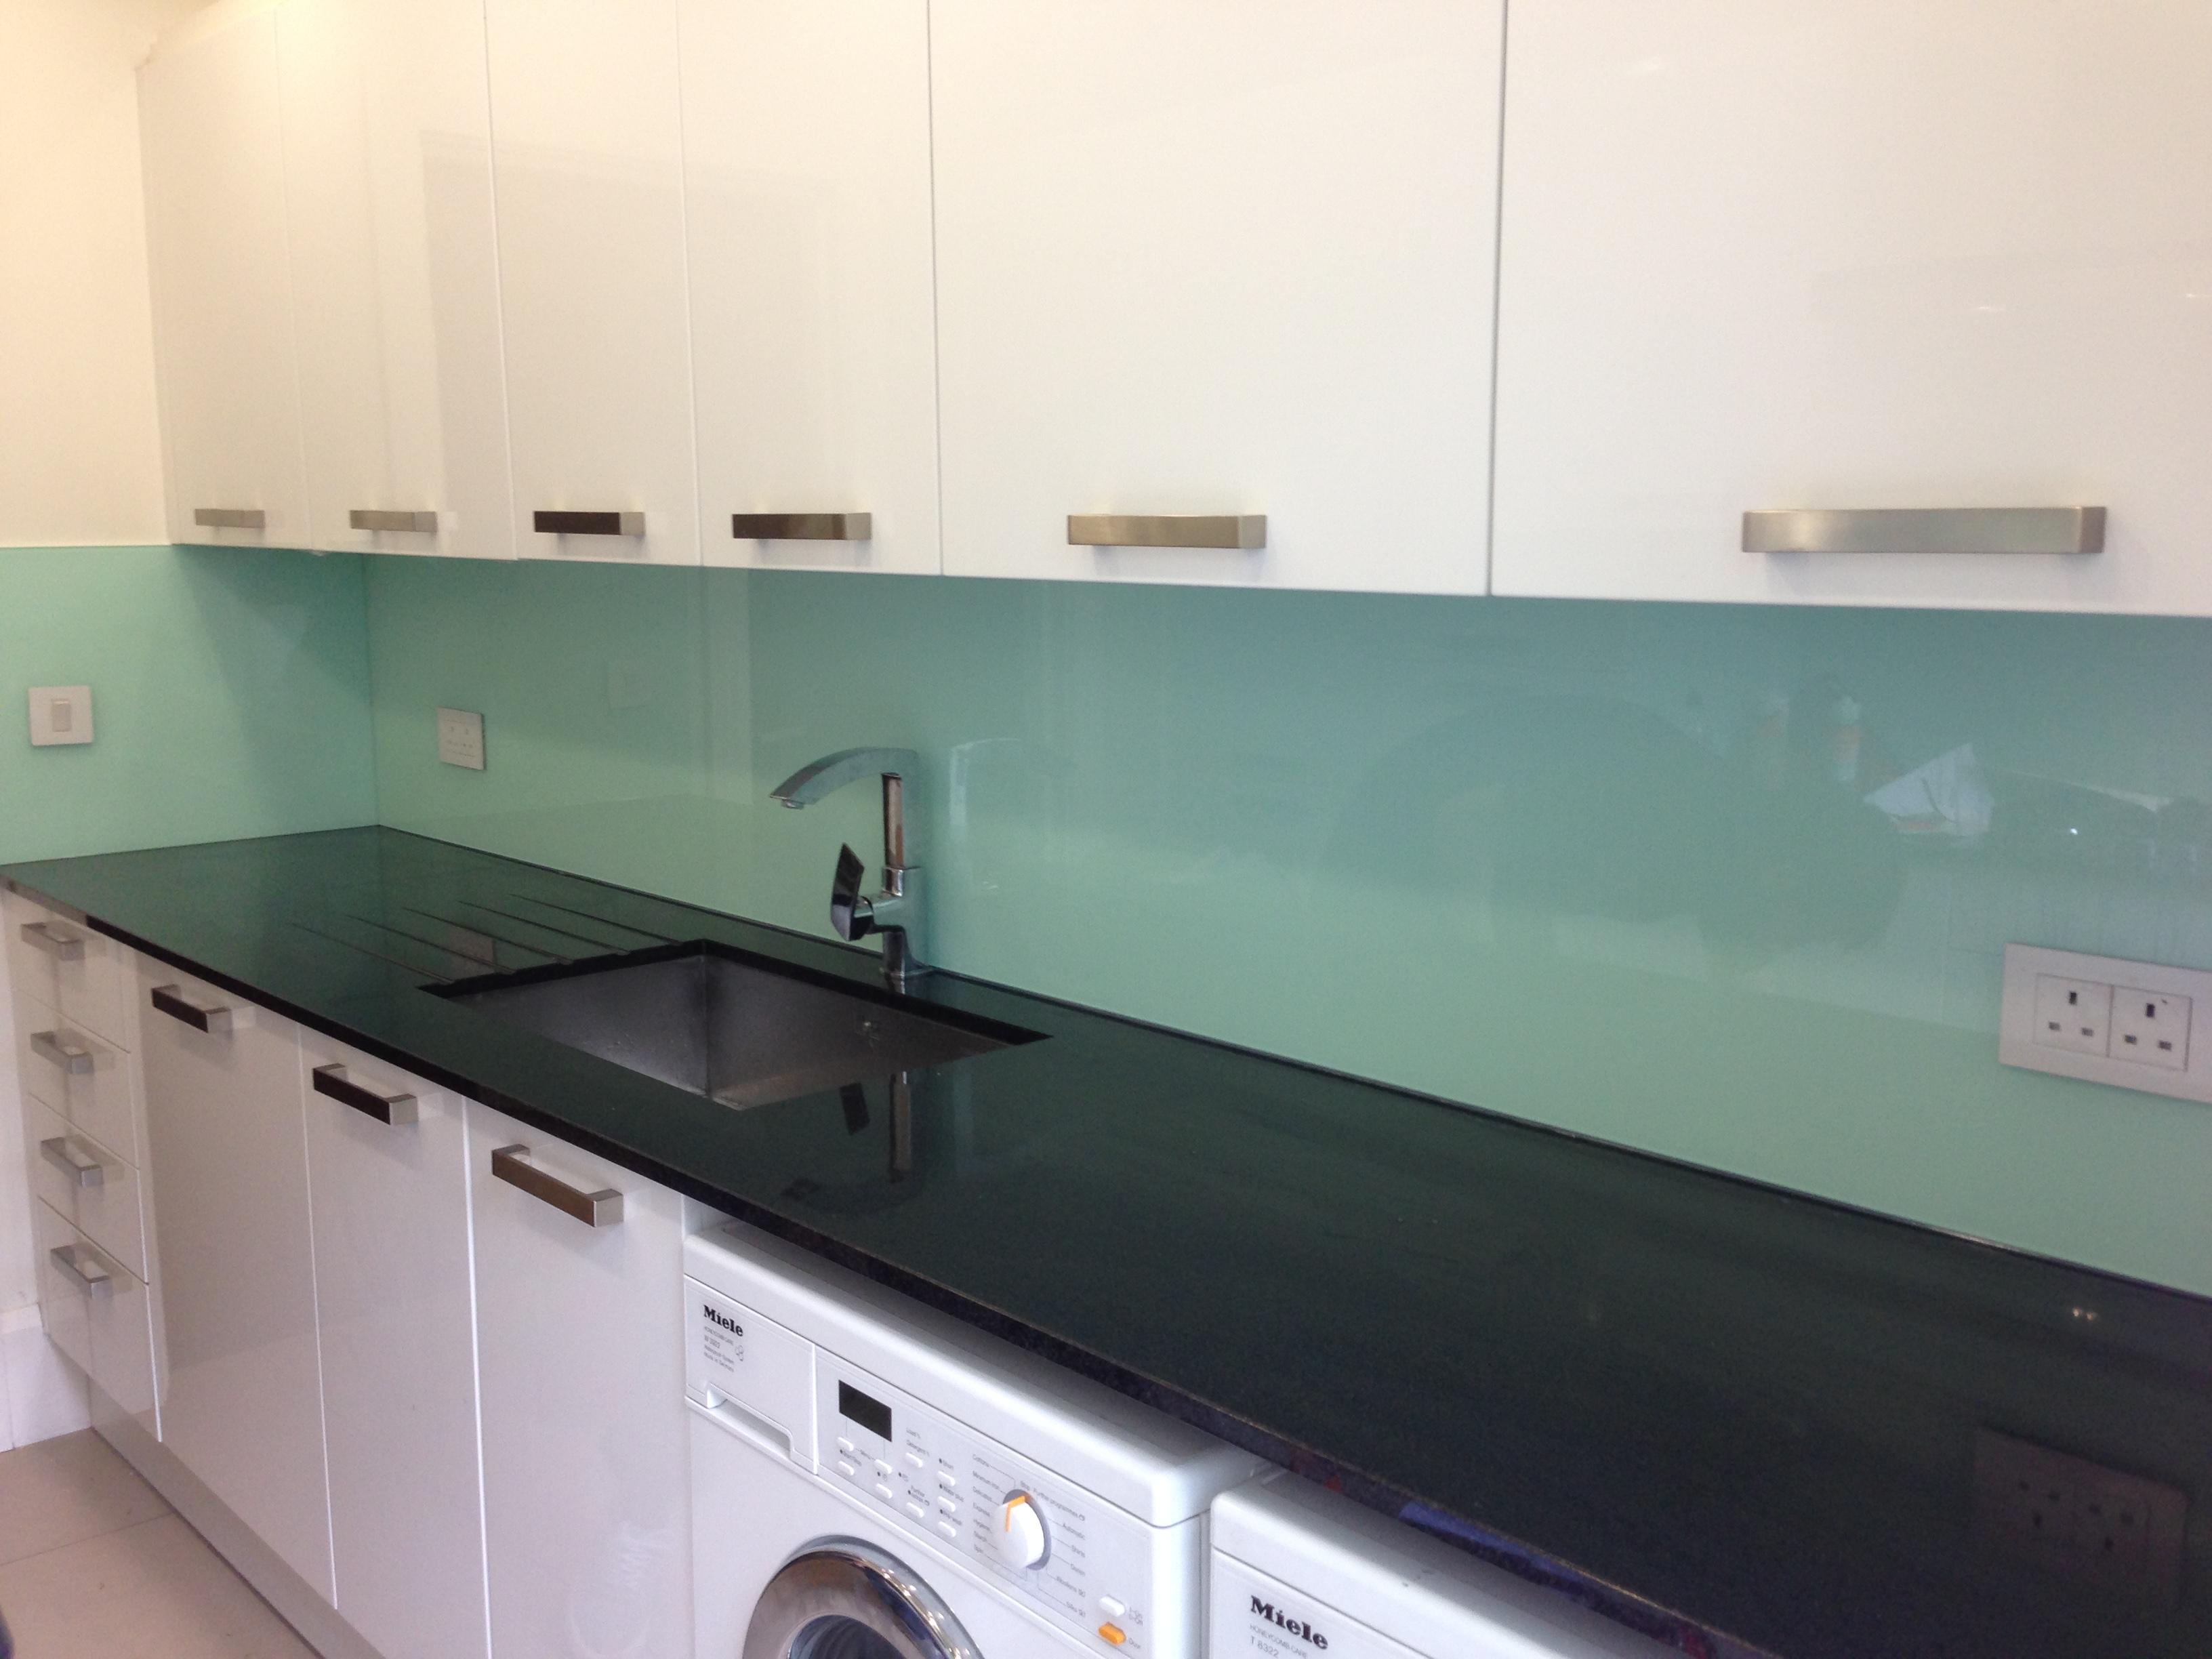 Glass splashback for your kitchen - Daily Dream Decor